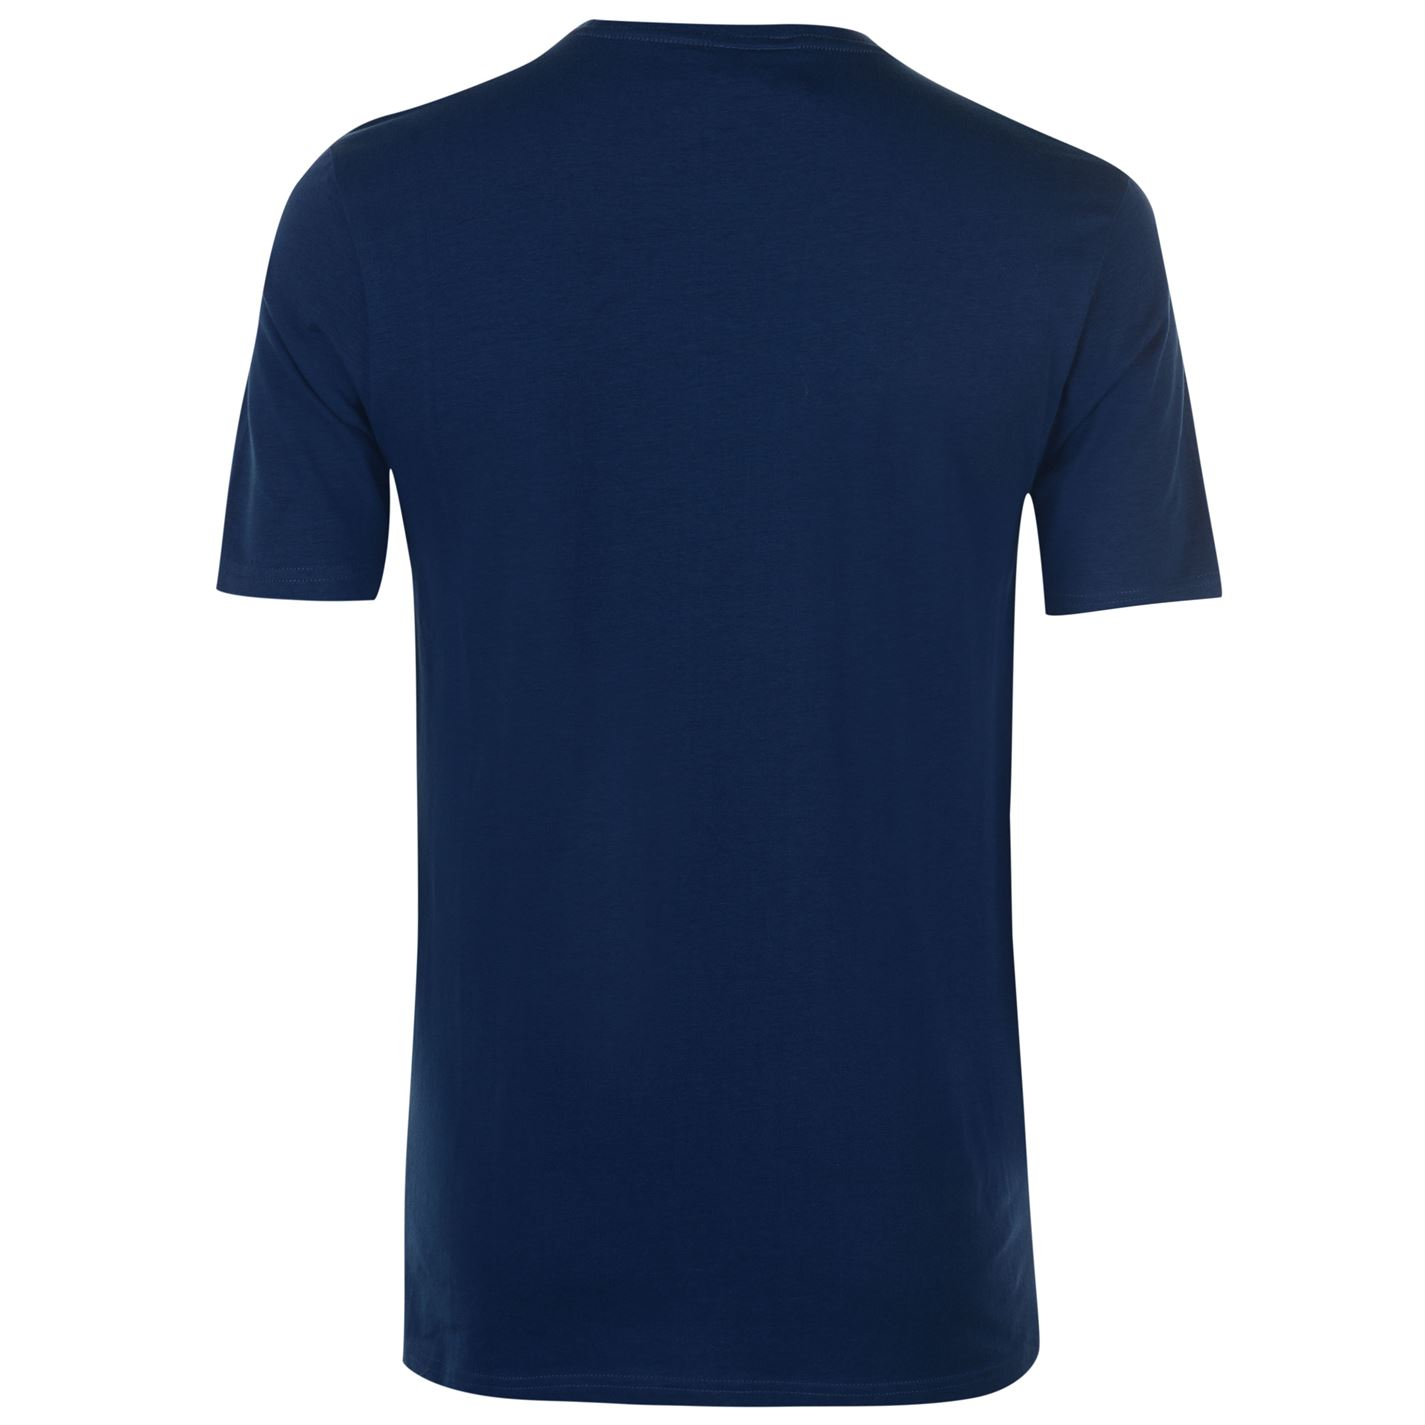 Caterpillar T Shirt Homme Chat Logo Performance ras-du-cou à manches courtes Tee T-shirt Top